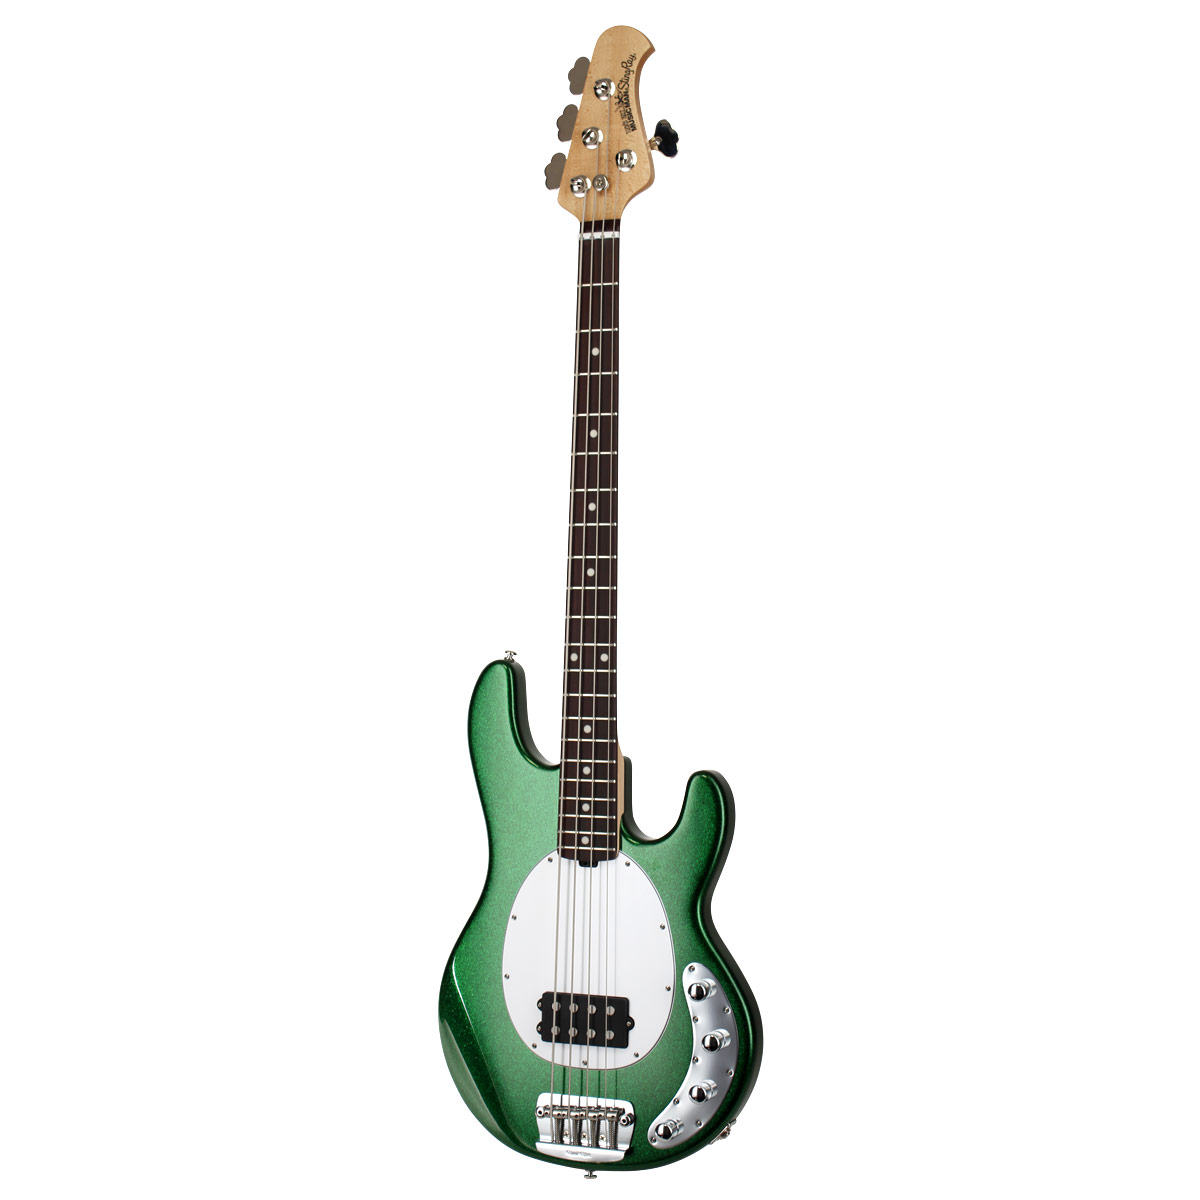 Stingray Eq 3 Band Emerald Sparkle